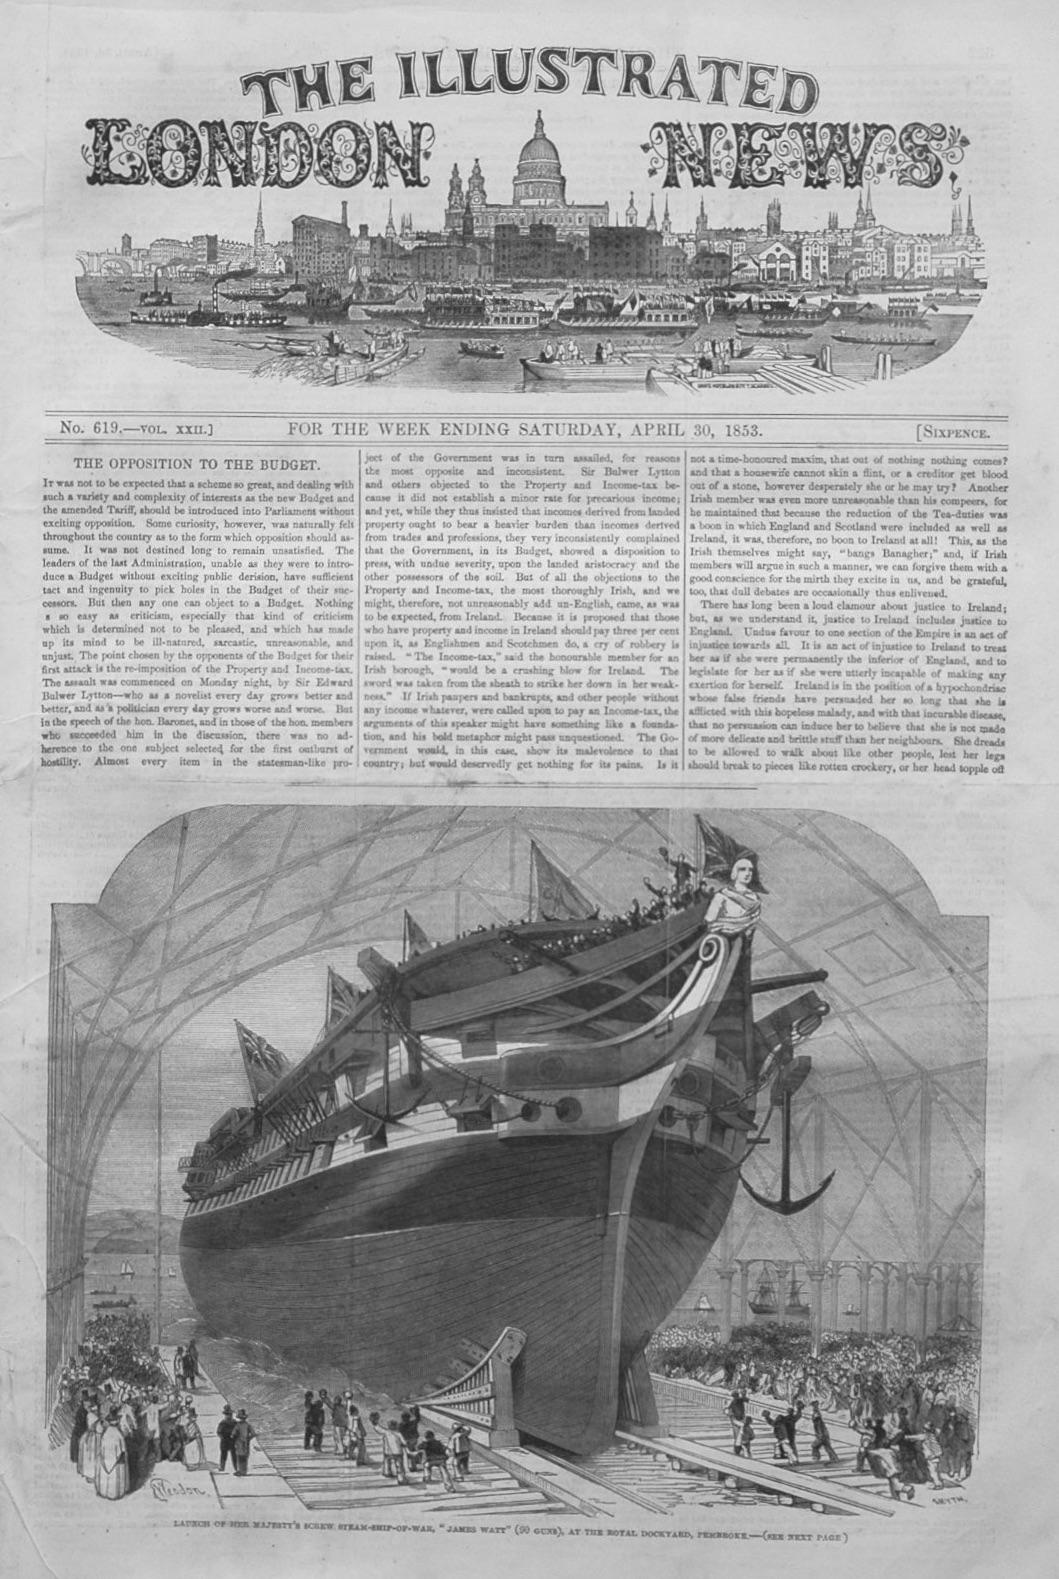 Illustrated London News April 30th, 1853.